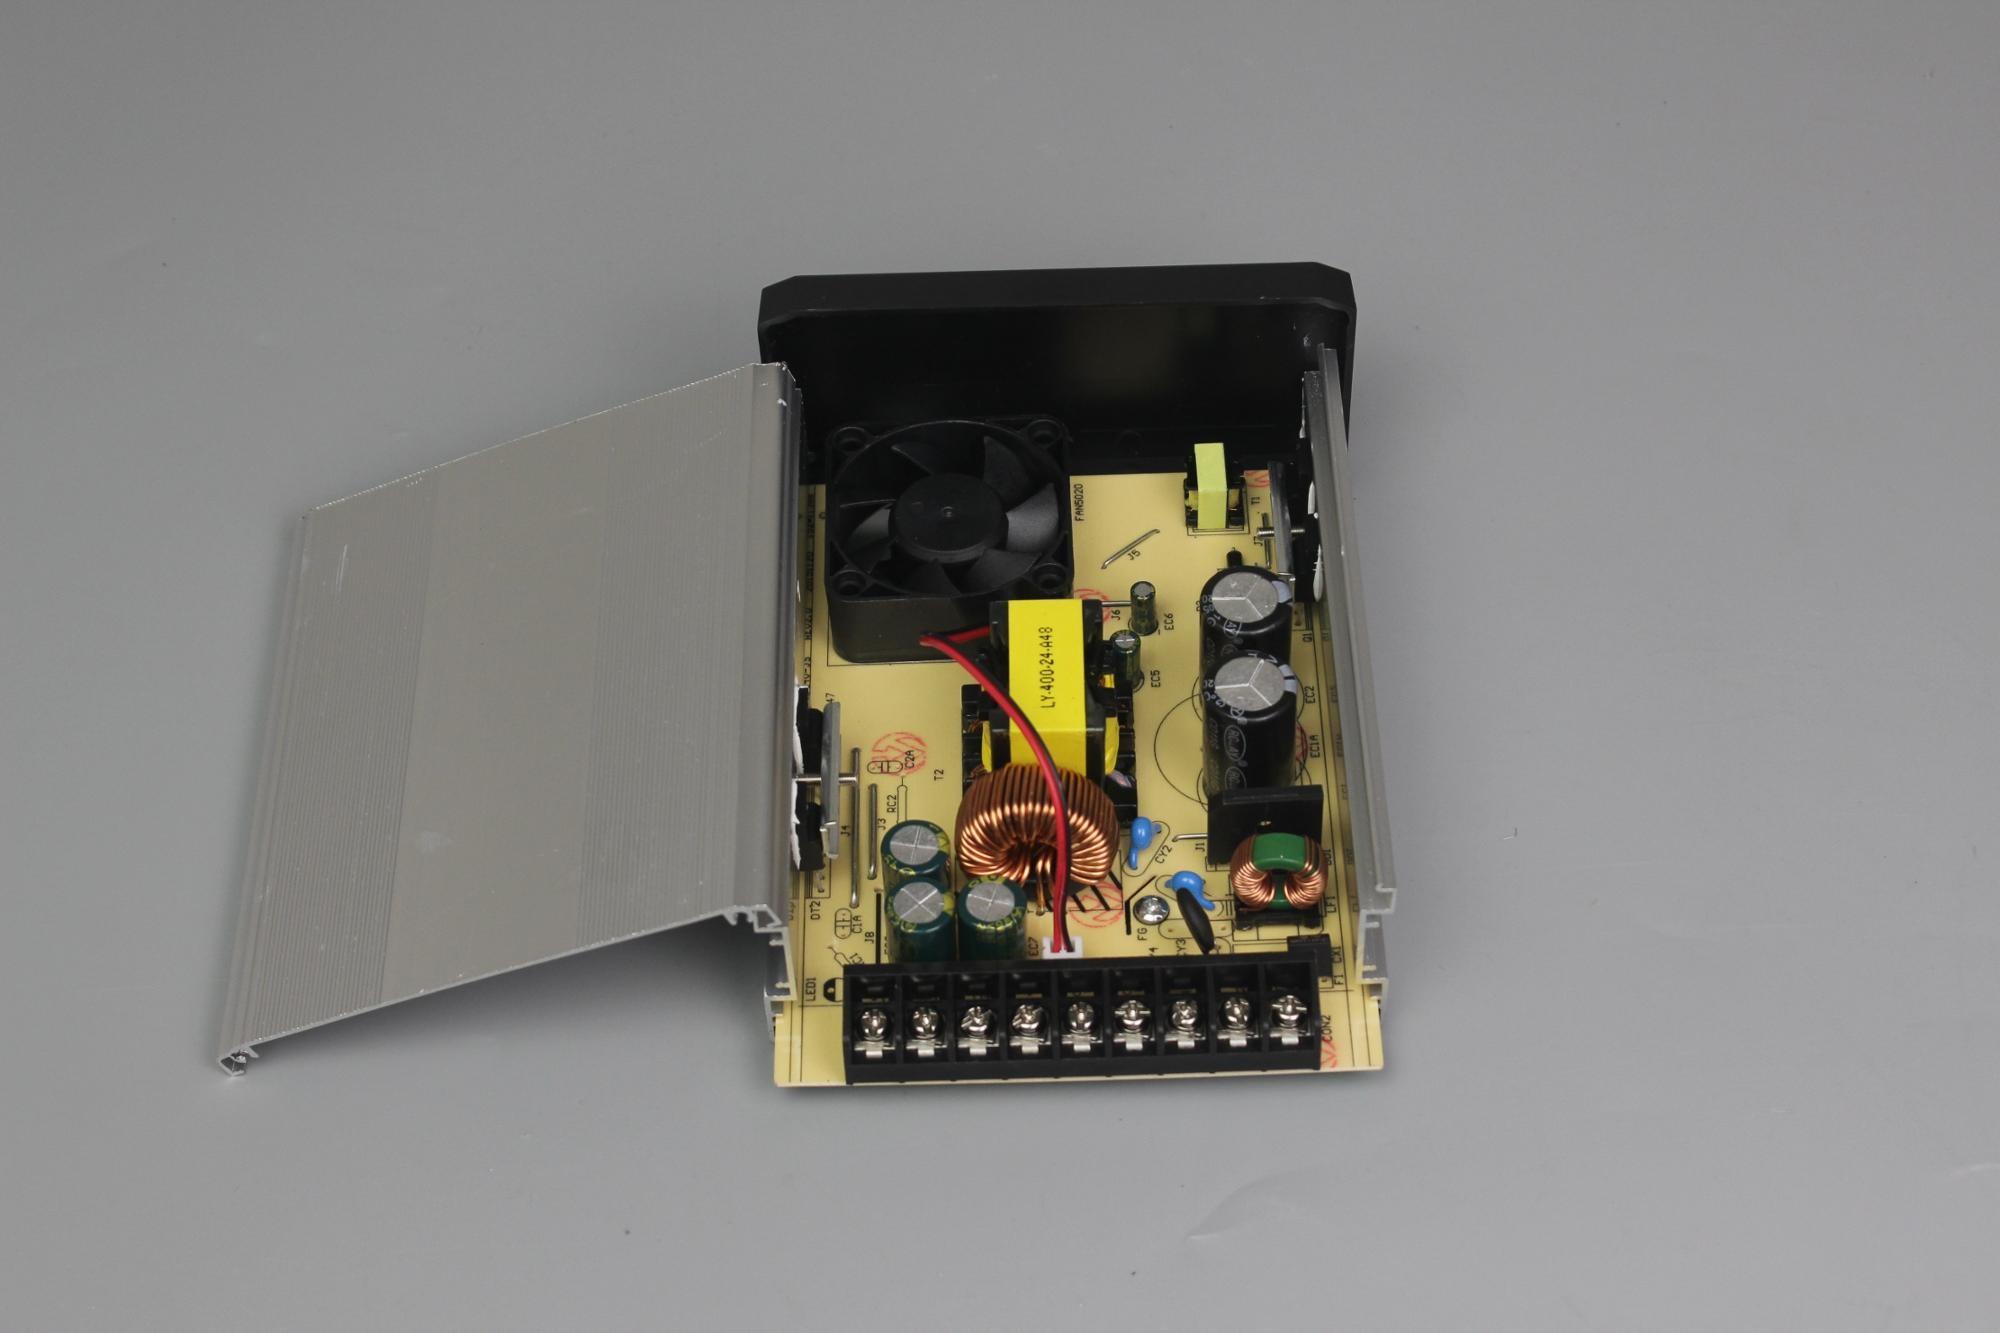 HIKVISION SET-5MPIX-HD-TVI-01 - Kamerový set, 5Mpix, HD-TVI technologie